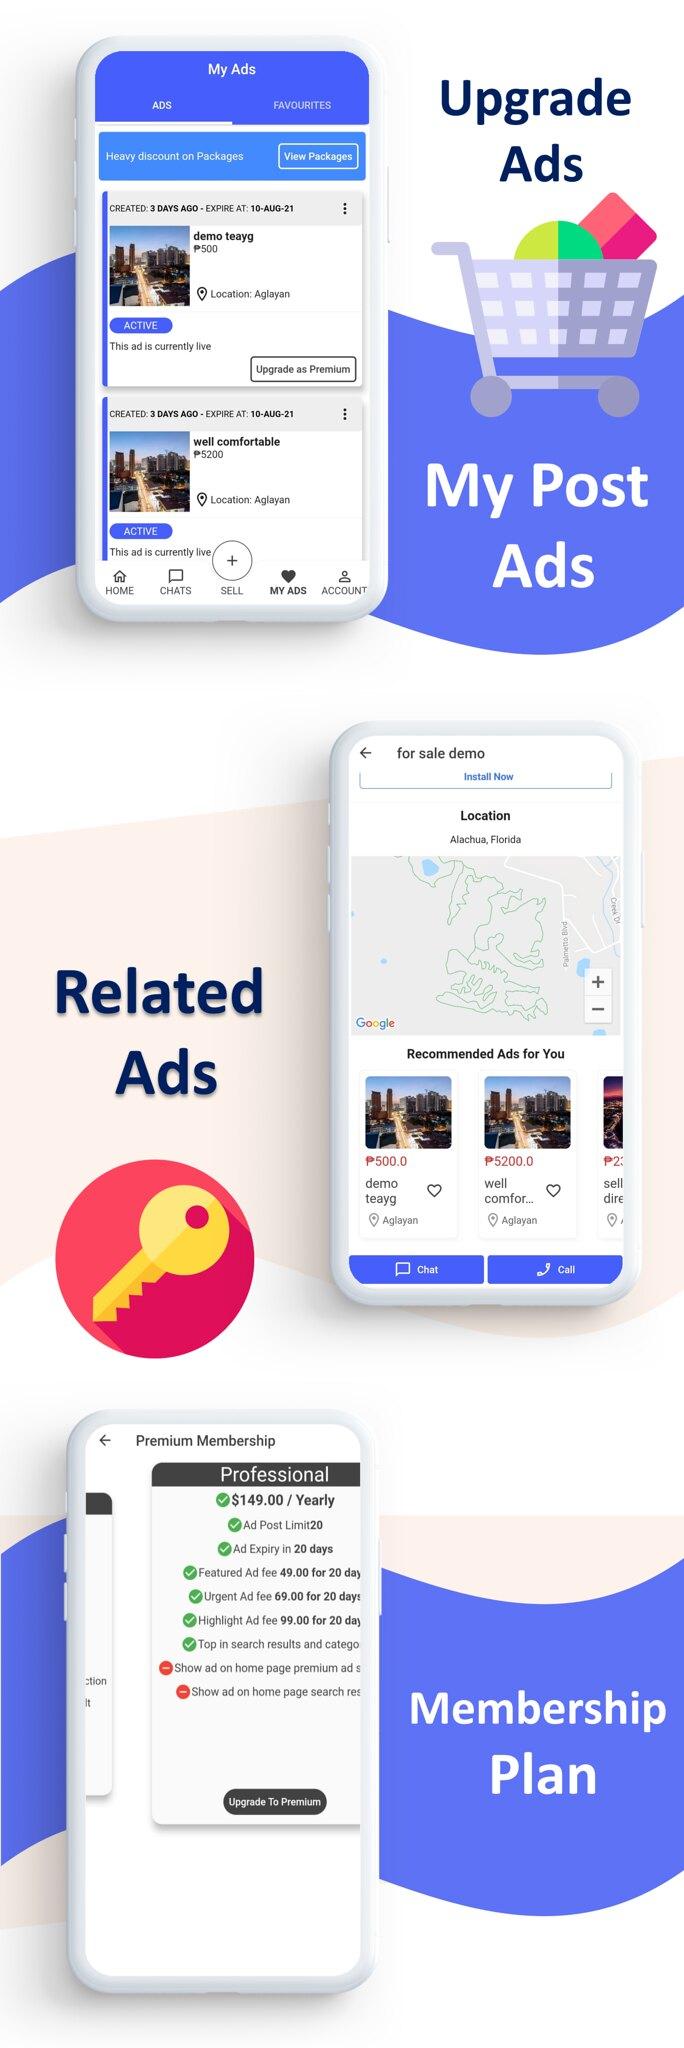 Mark Classified App    App classificado    Gateways de múltiplos pagamentos integrados    Compra e Venda    Assinatura - 7